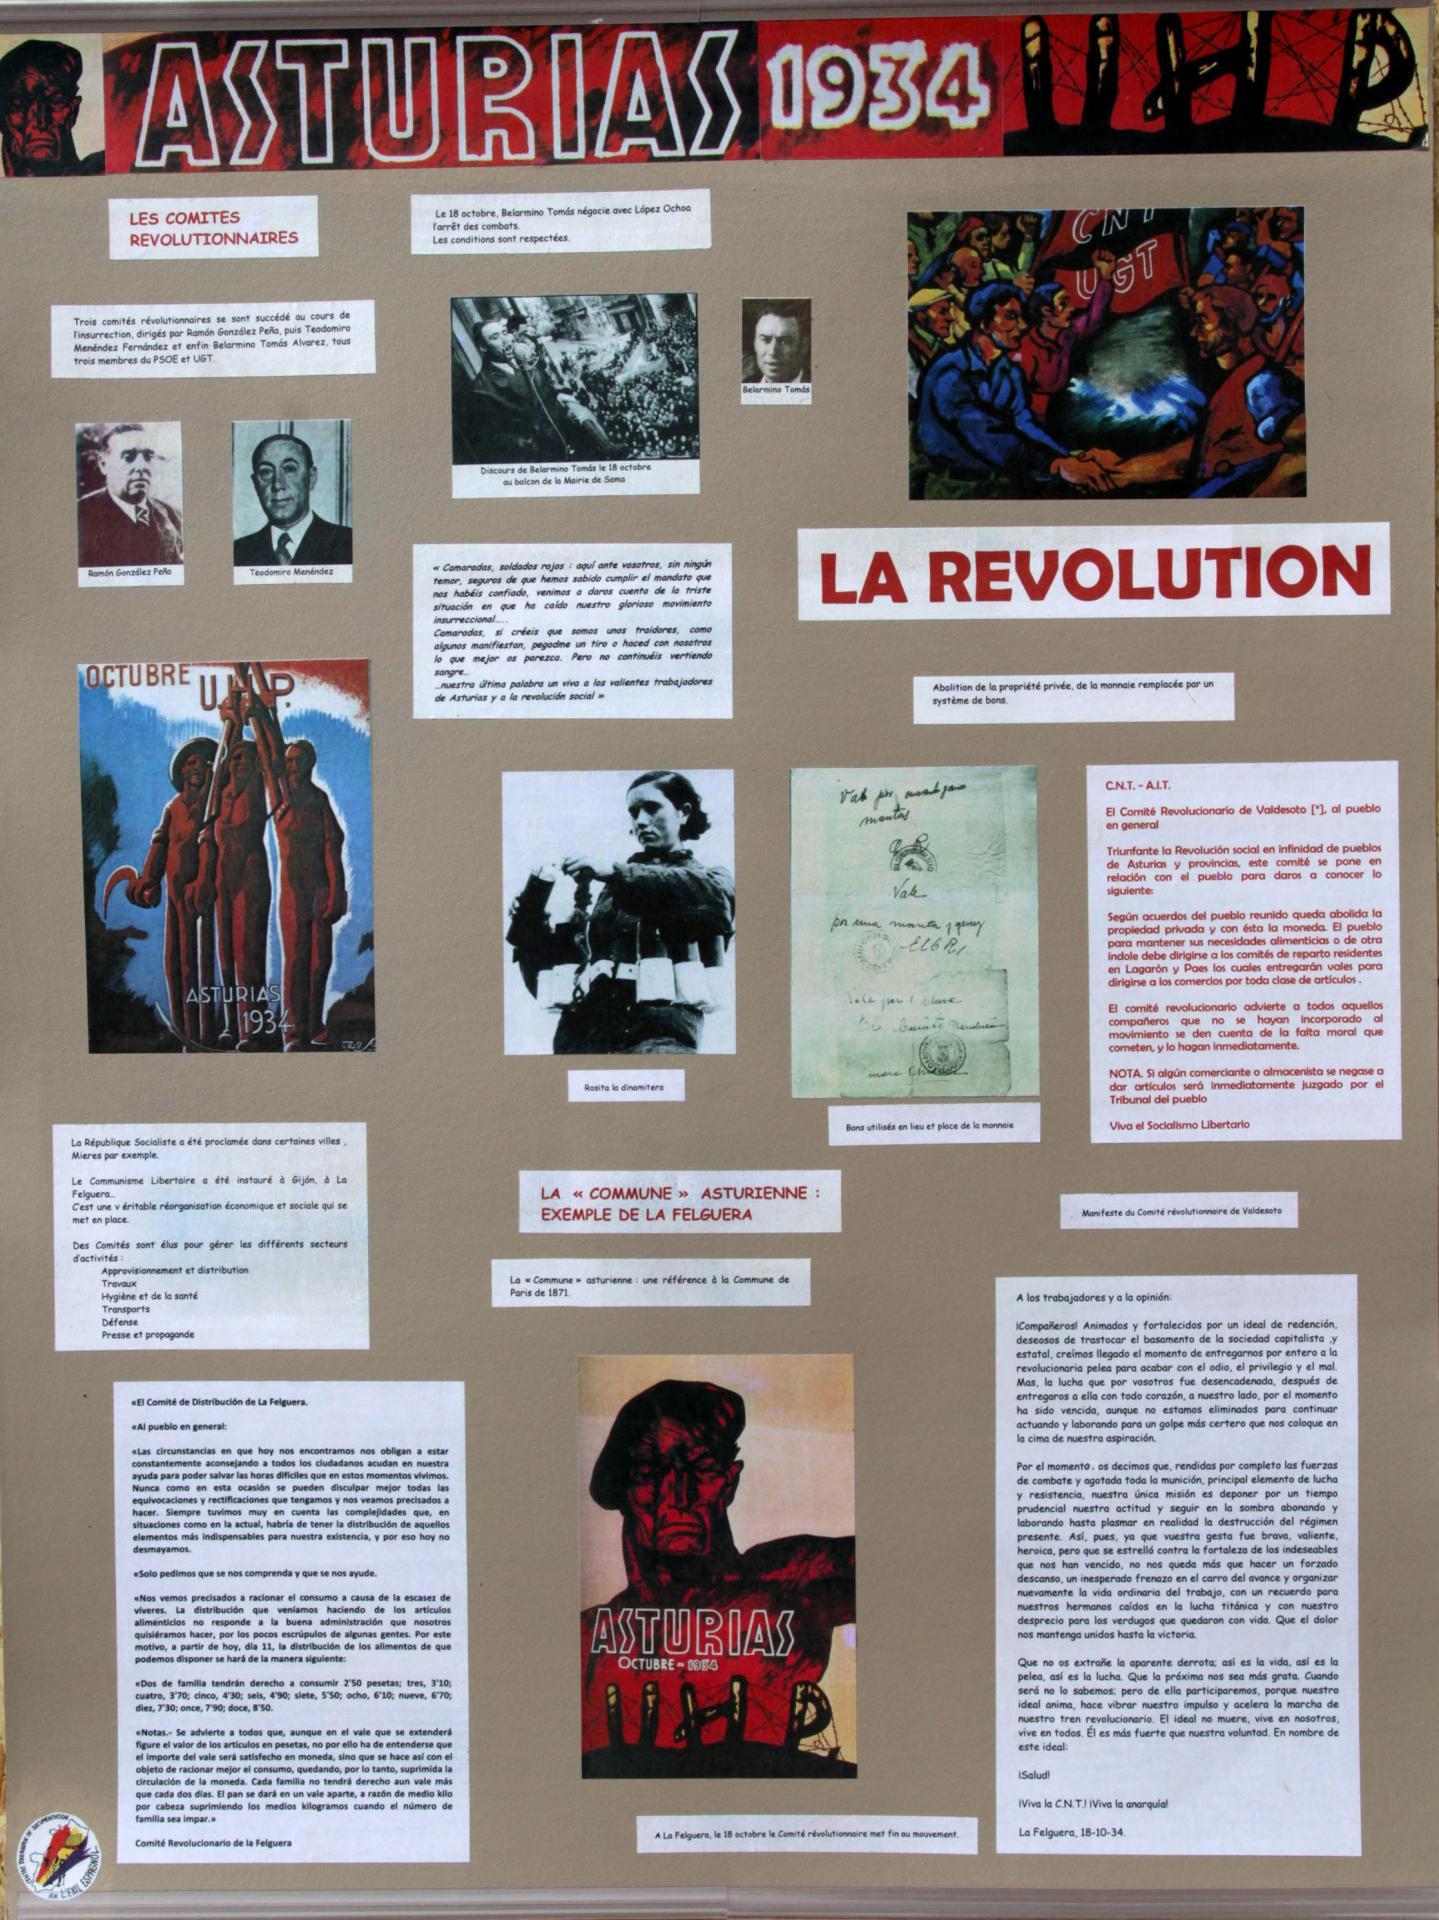 Asturias 1934 revolution 50ppp